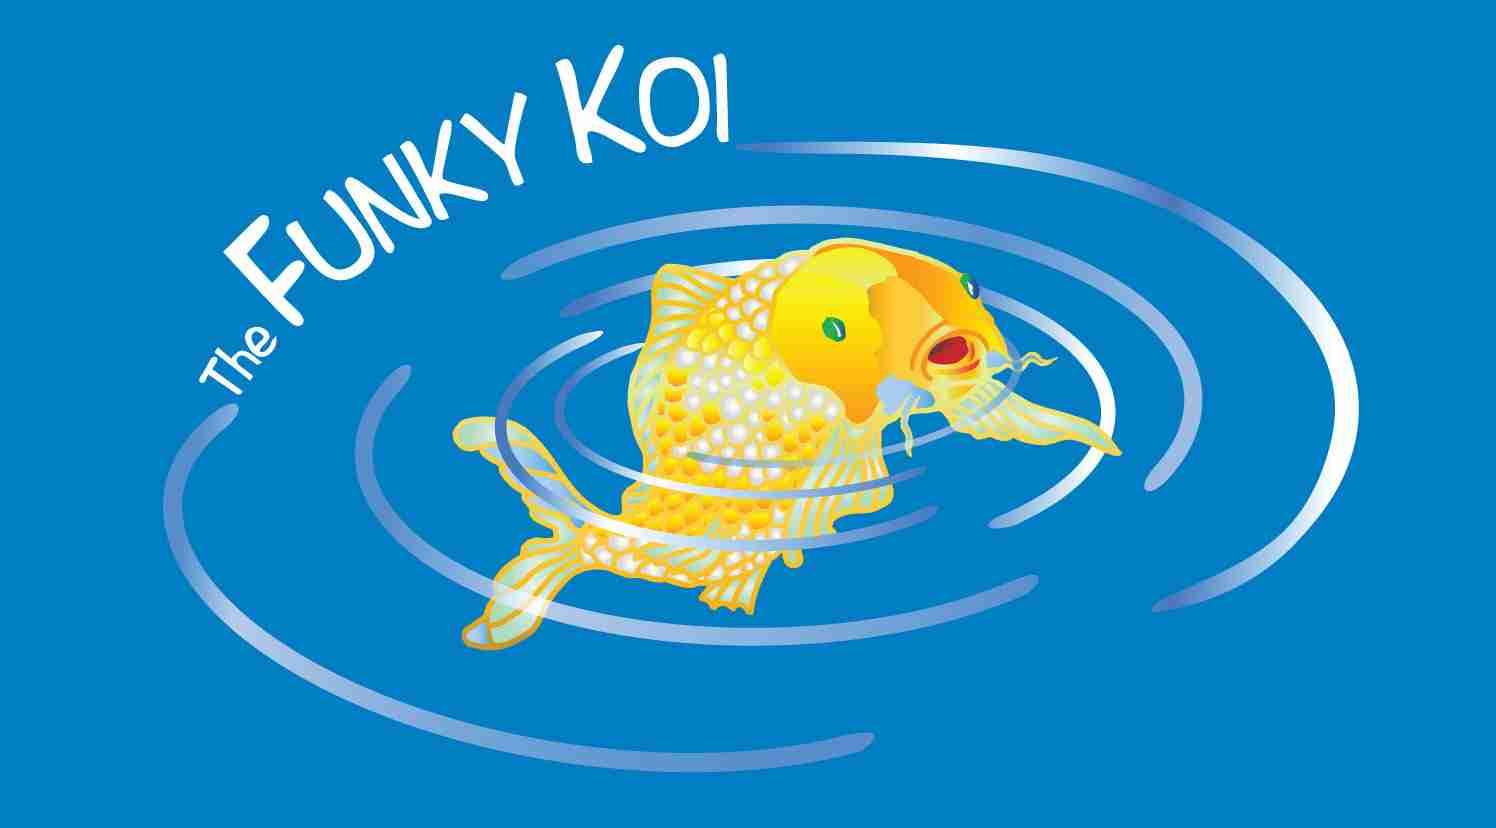 The Funky Koi Berkley Ma: The Funky Koi